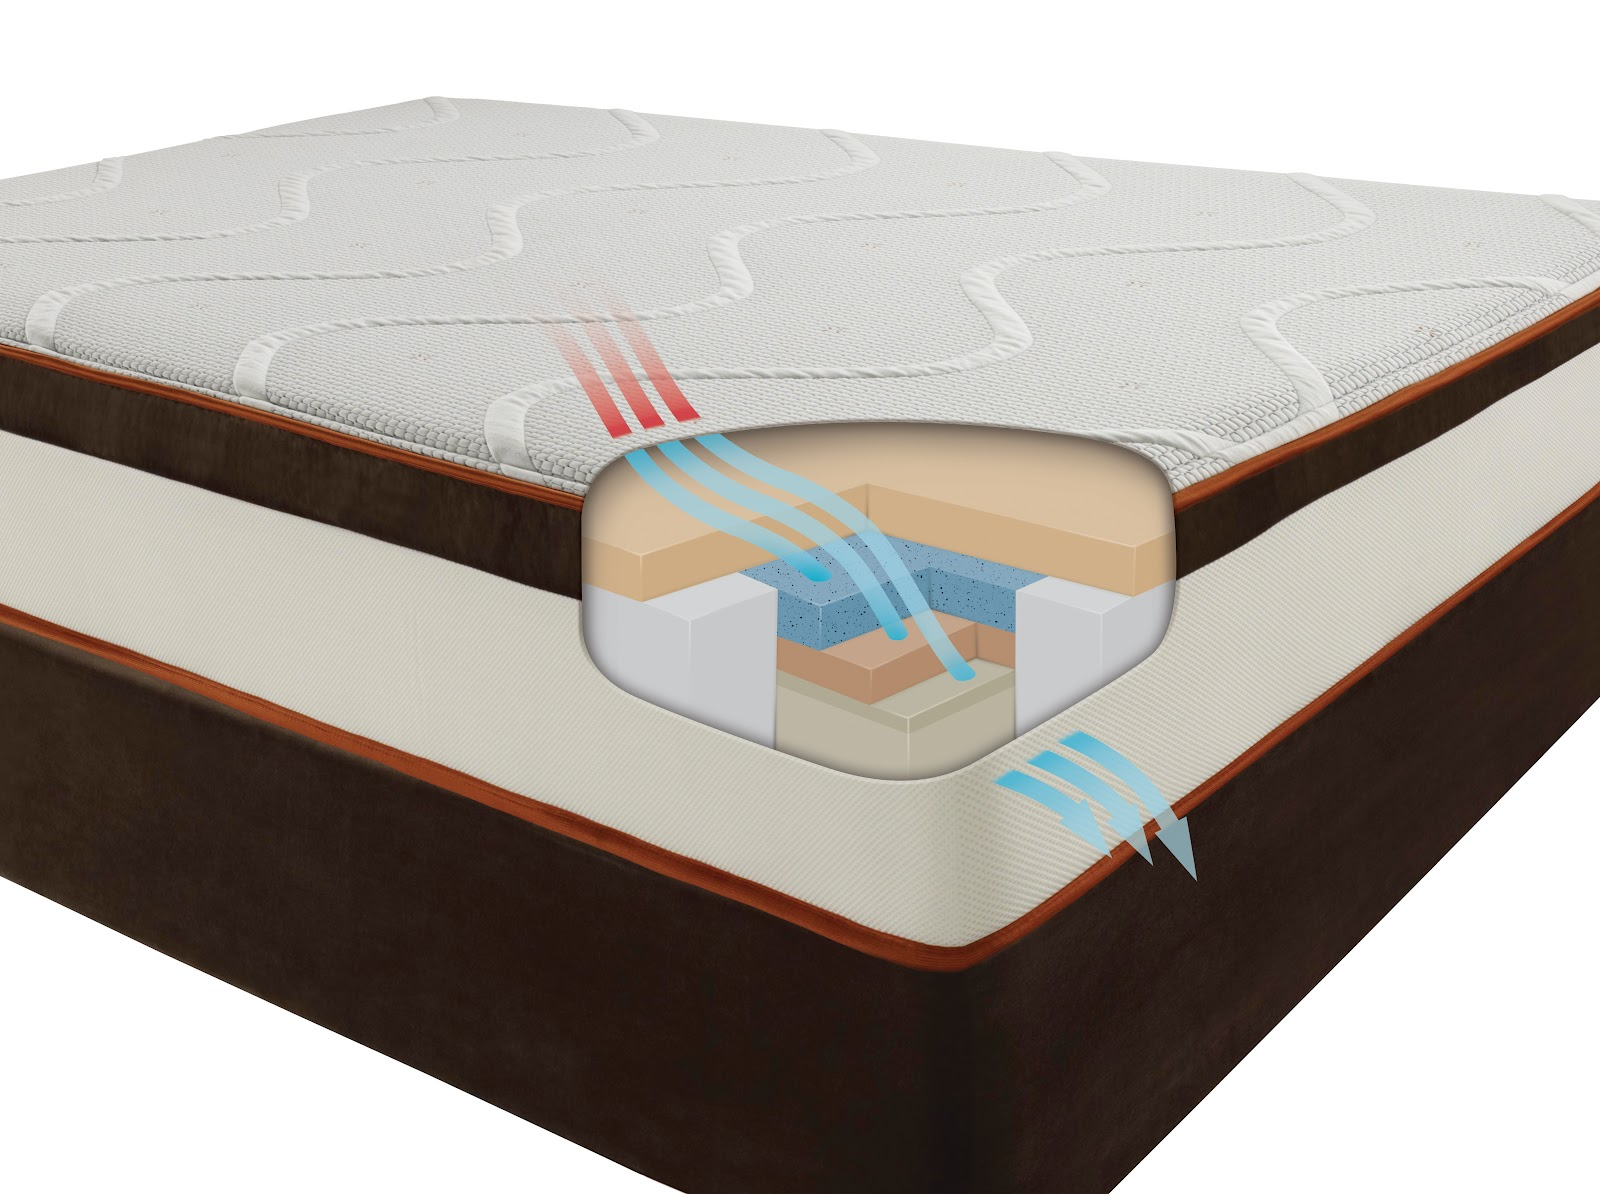 Simmons TruEnergy Sleep System Review